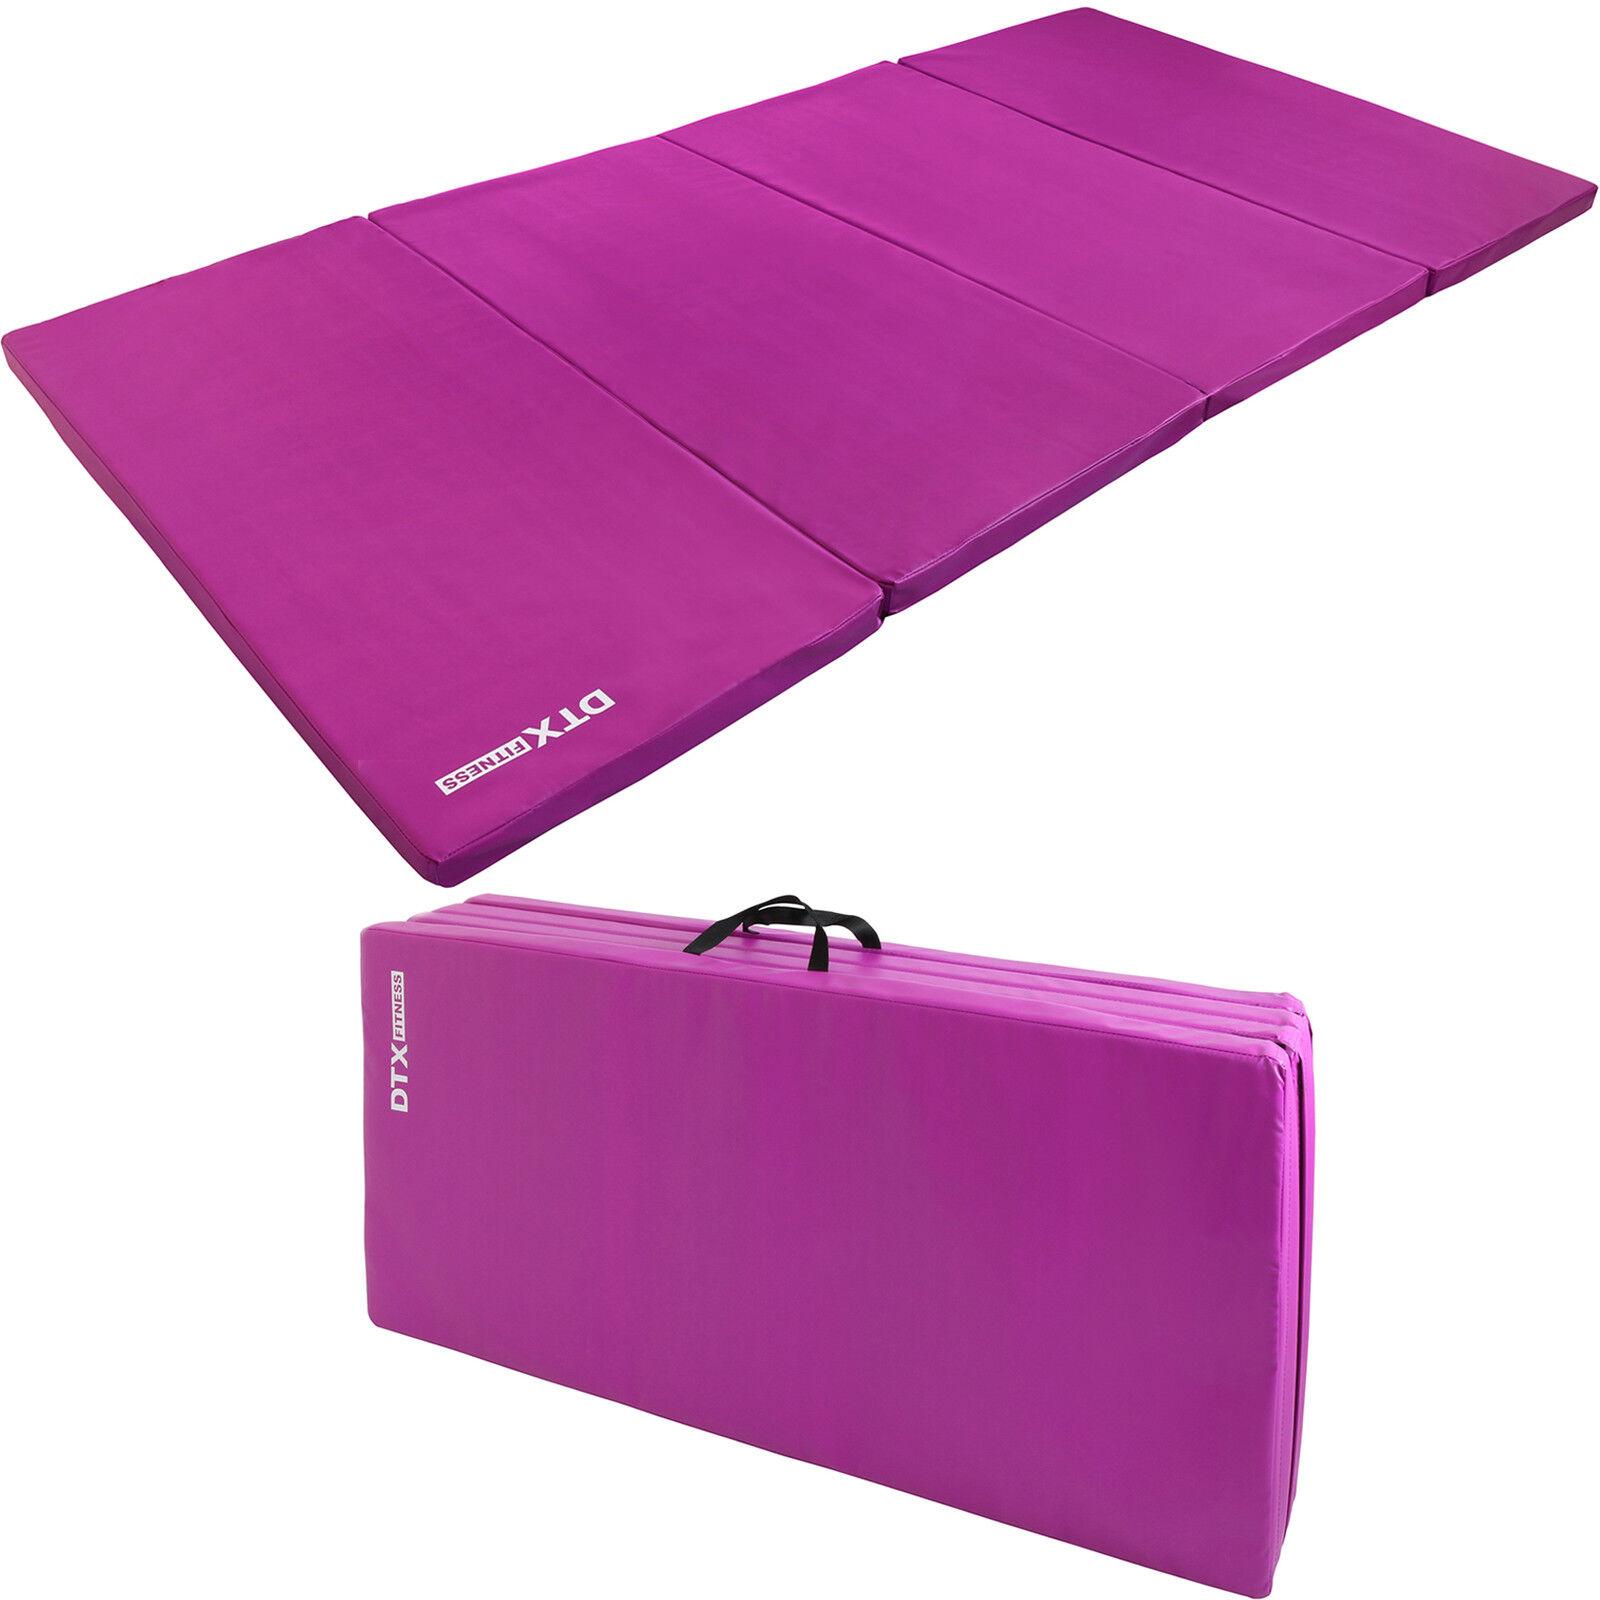 DTX Fitness Purple Folding Large Exercise Floor Mat Yoga Pilate Workout Gym Mat